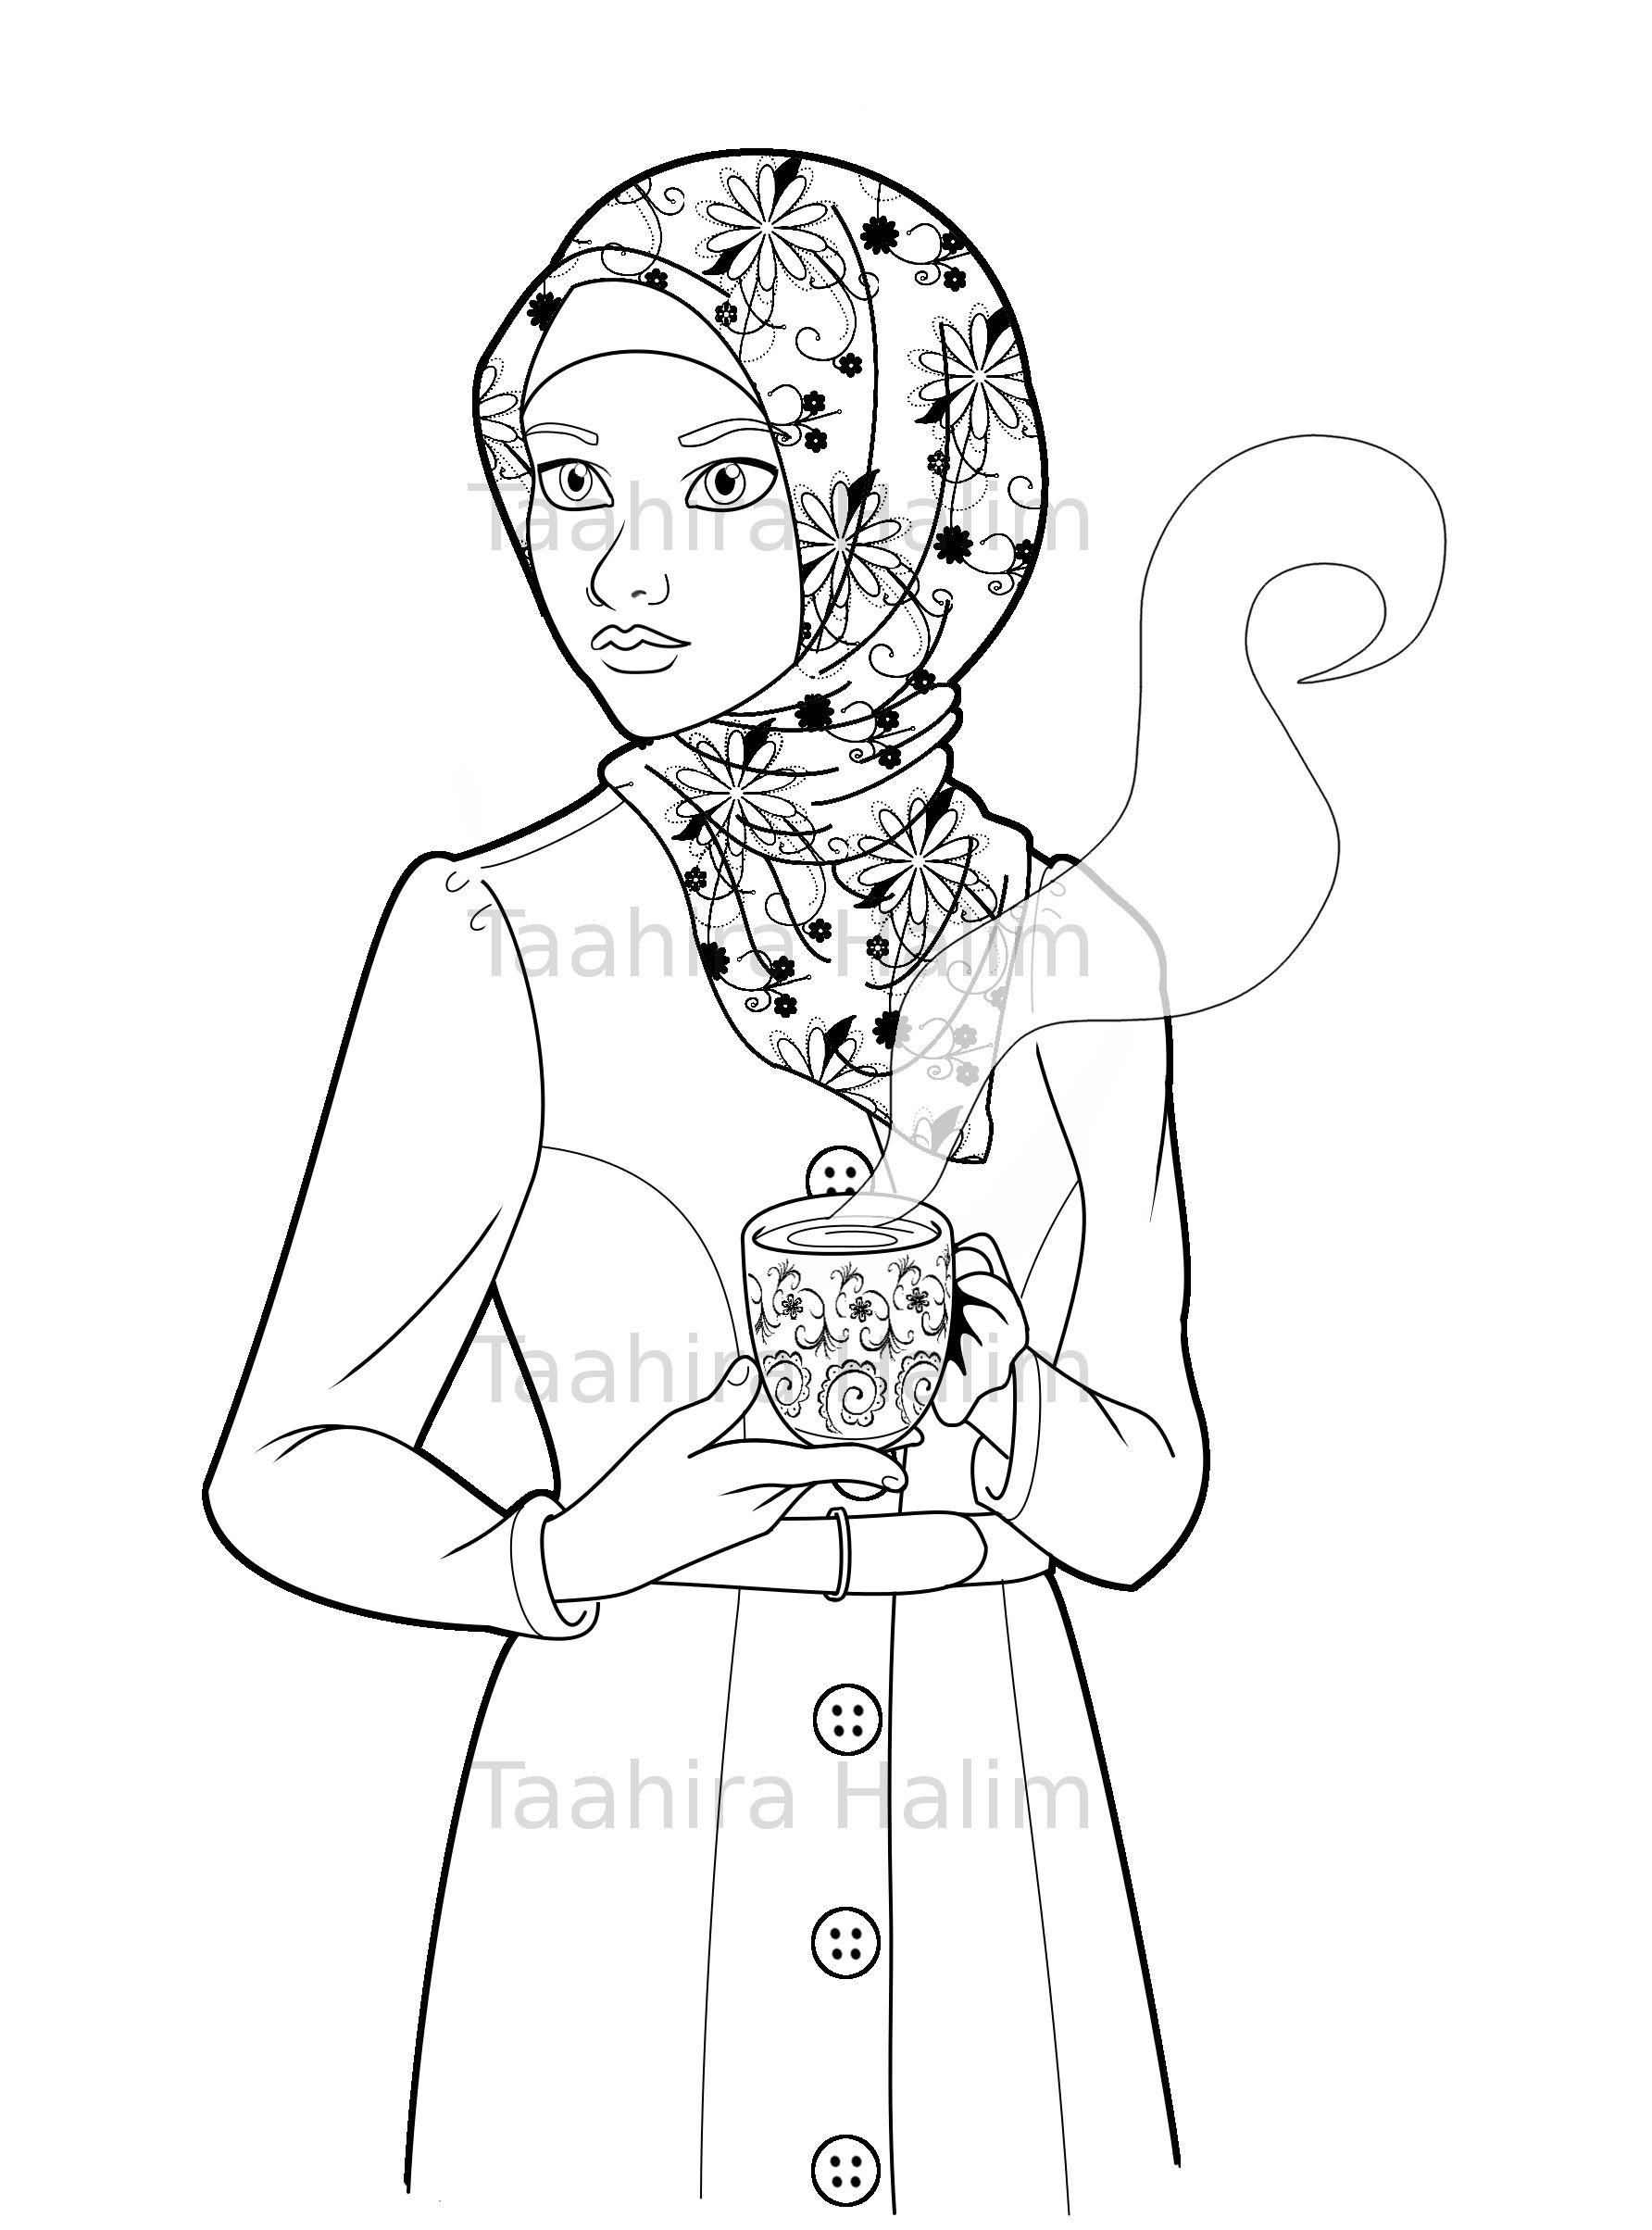 Islamic coloring page featuring a cute hijabi muslim girl